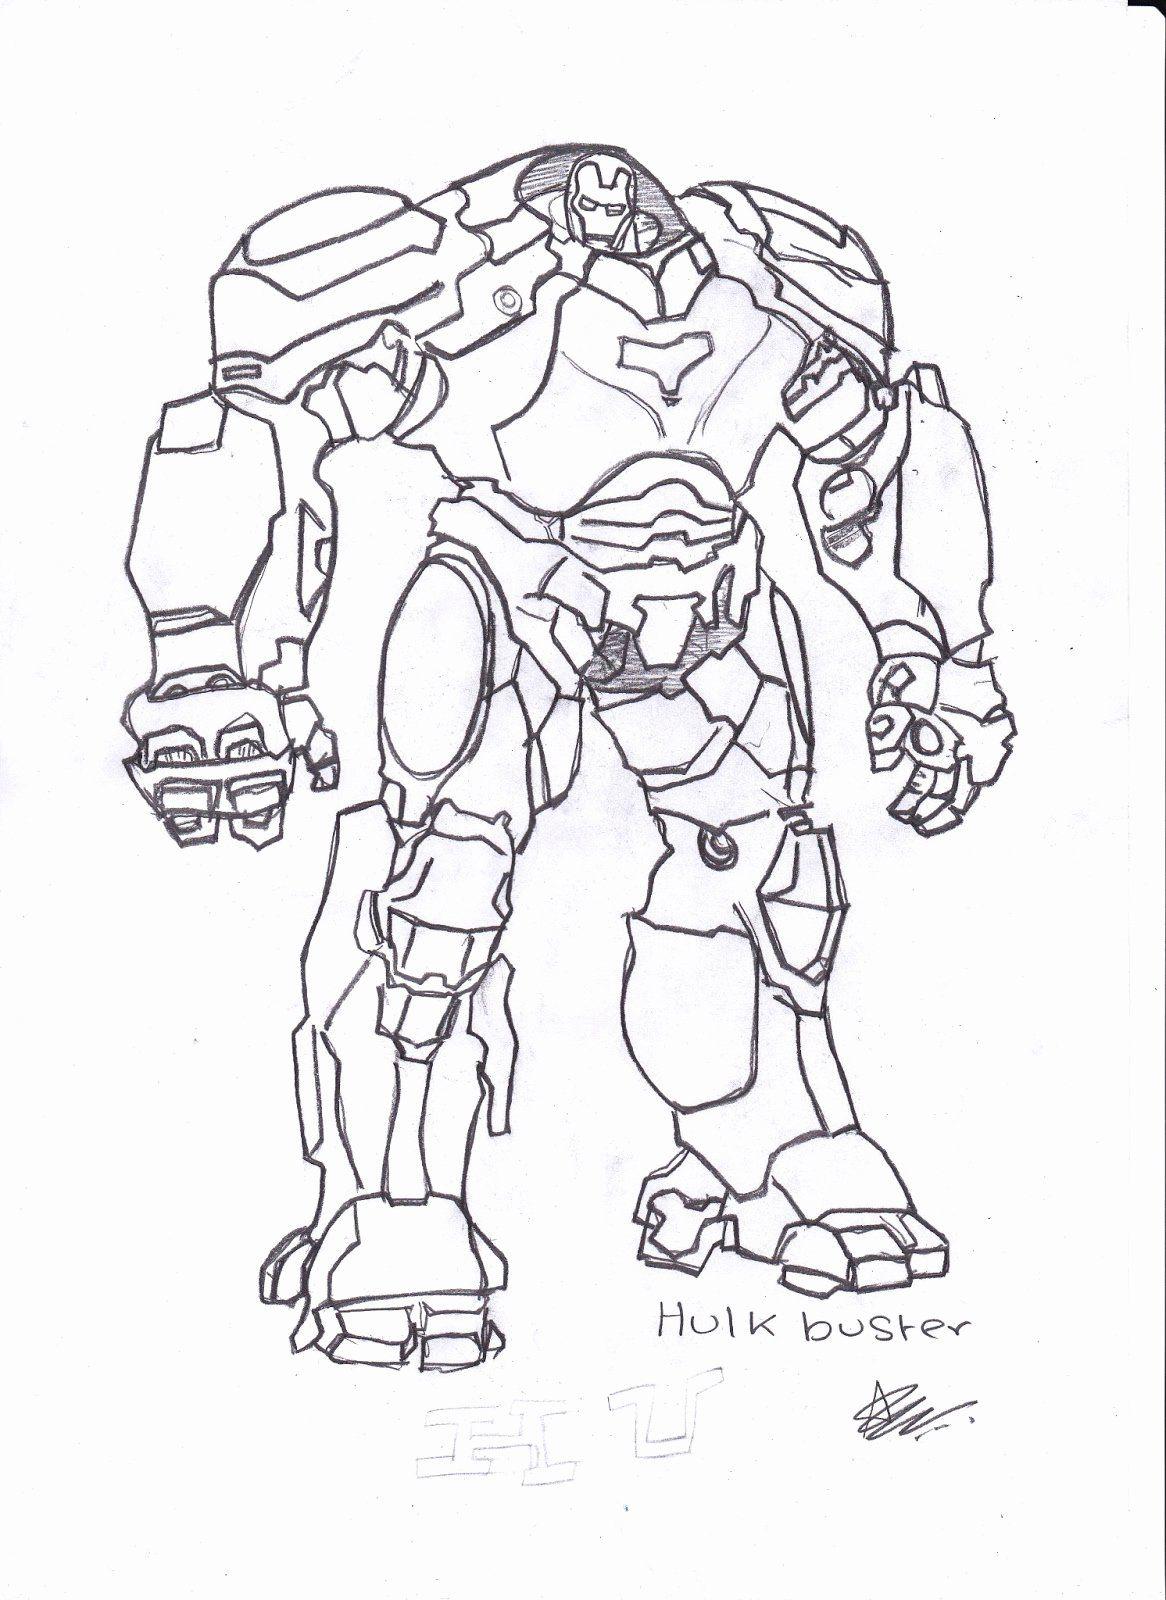 Hulk Buster Coloring Page Elegant Akshay S Blog Sketches Coloring Pages Hulkbuster Ninjago Coloring Pages